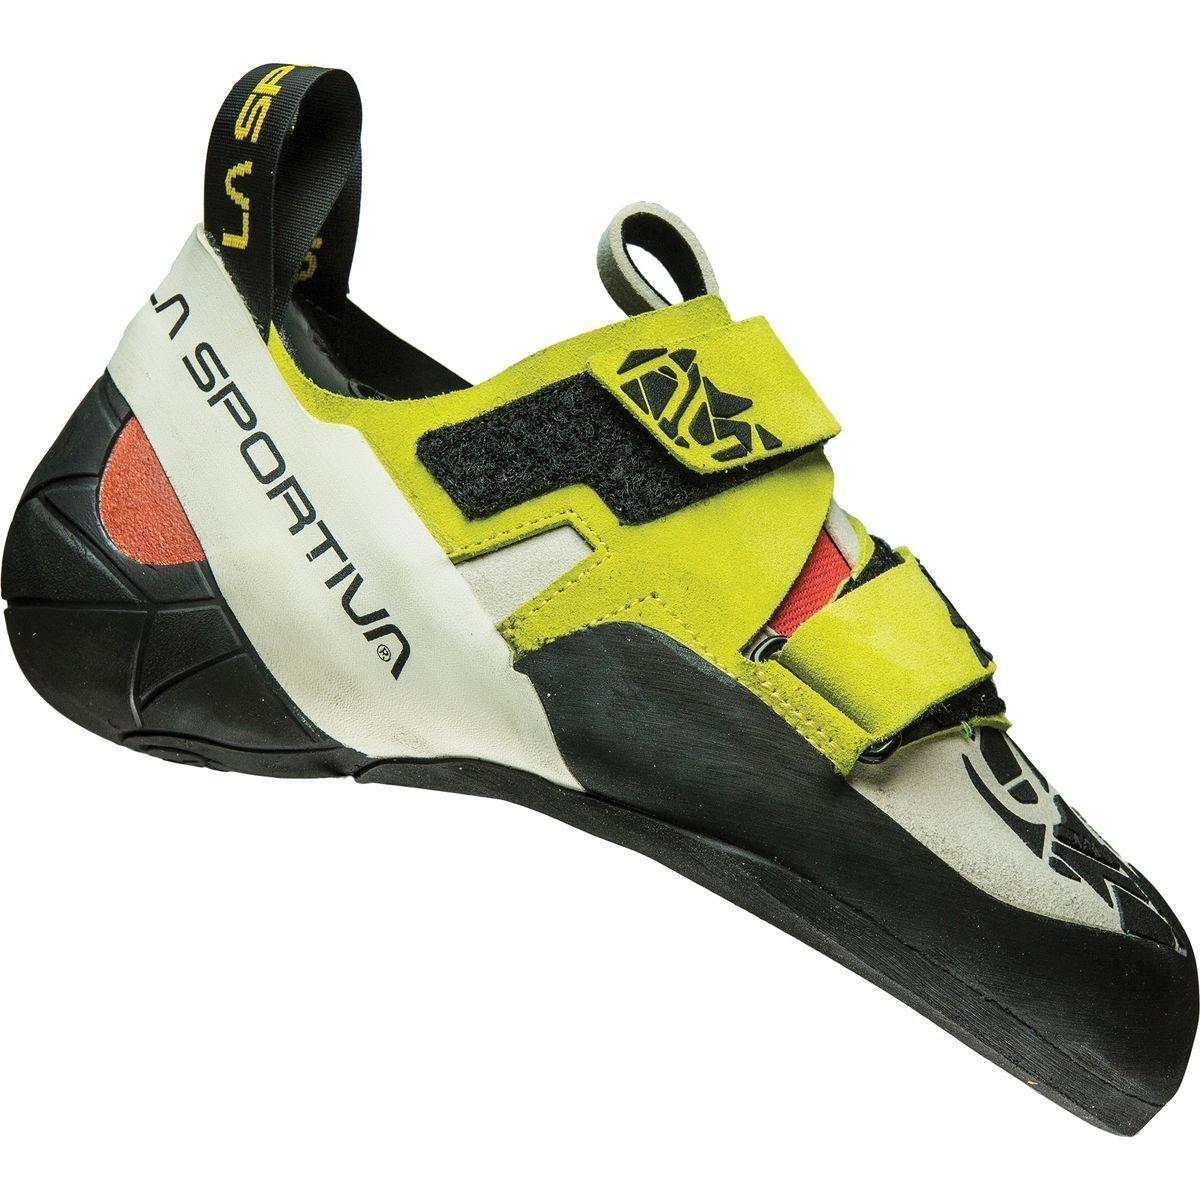 La Sportiva Otaki Climbing Shoe - Women's B01015ZZYY 34 M EU|Sulphur / Coral